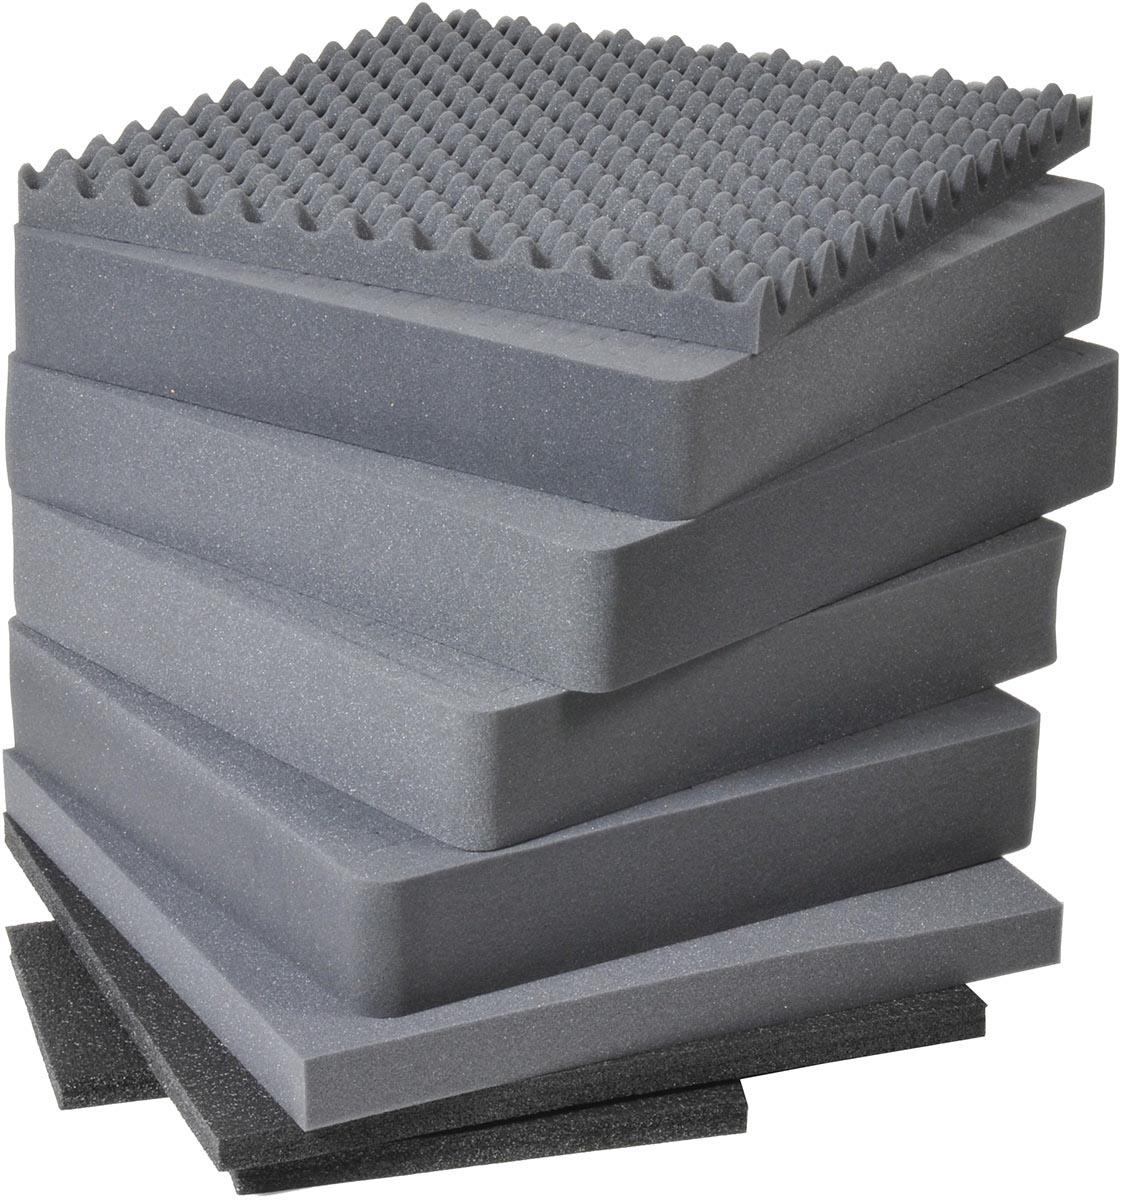 pelican 0371 replacement foam 0370 case